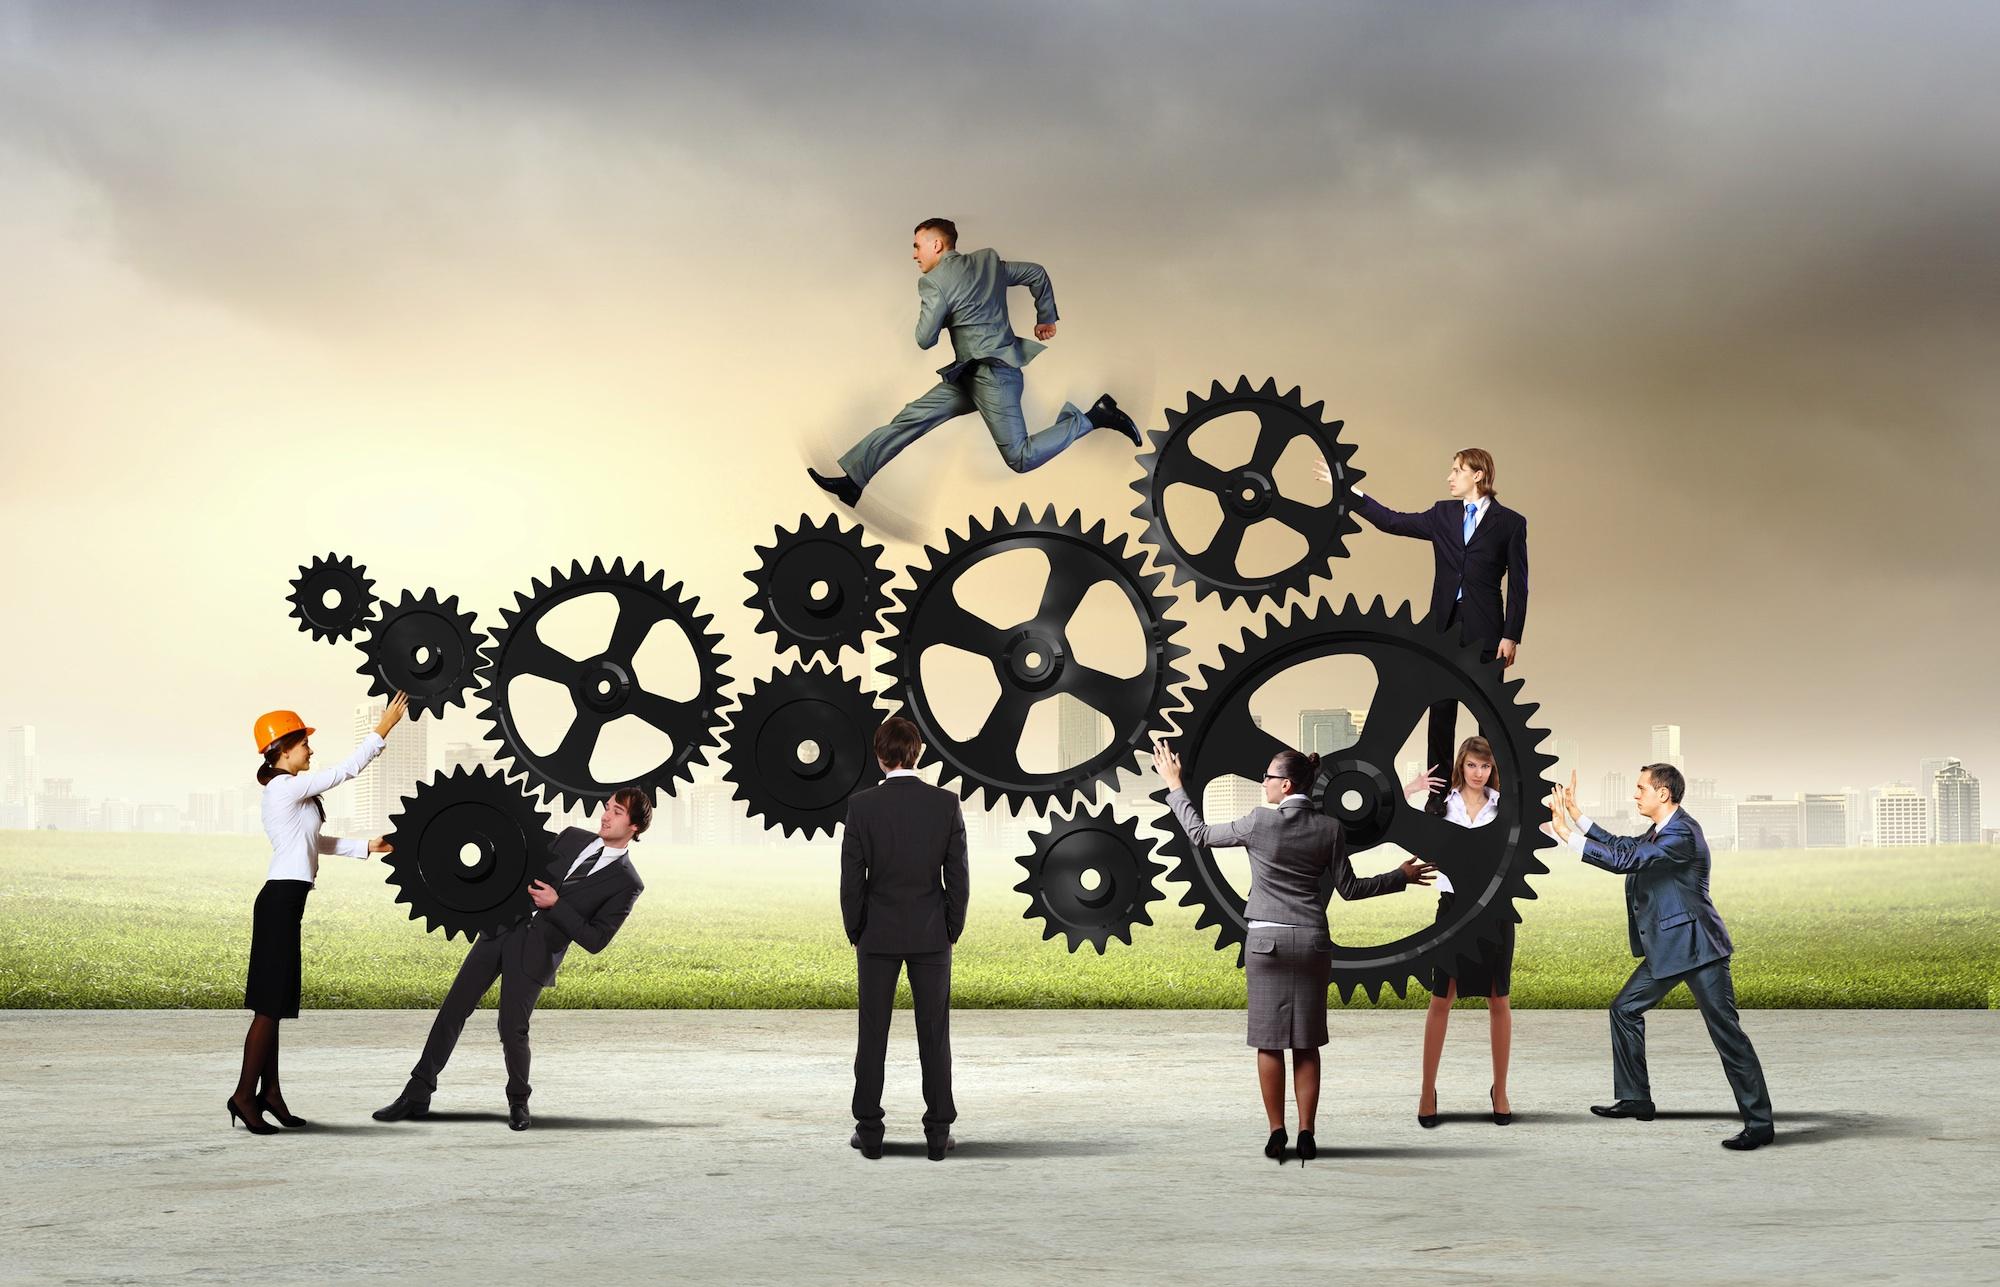 Developing Enterprise Apps Isn't as Boring as it Sounds